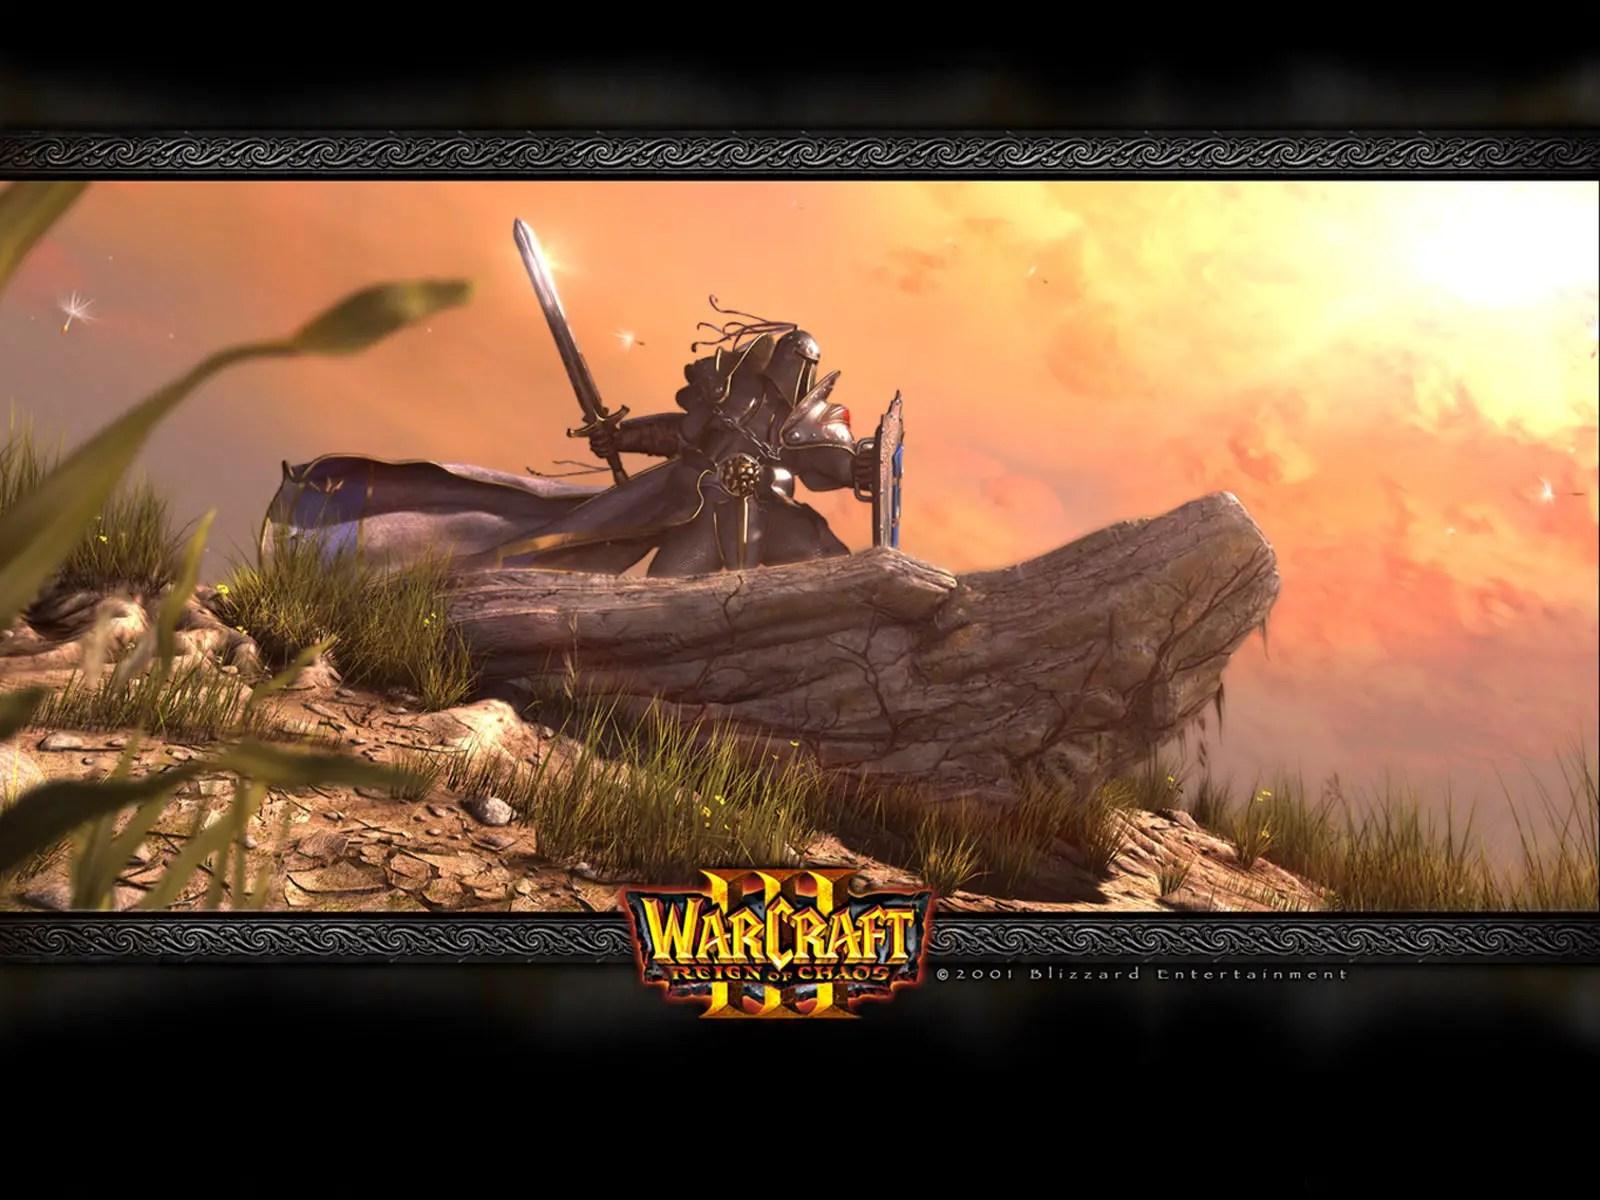 Warcraft 3 Wallpaper Warcraft 3 Tools